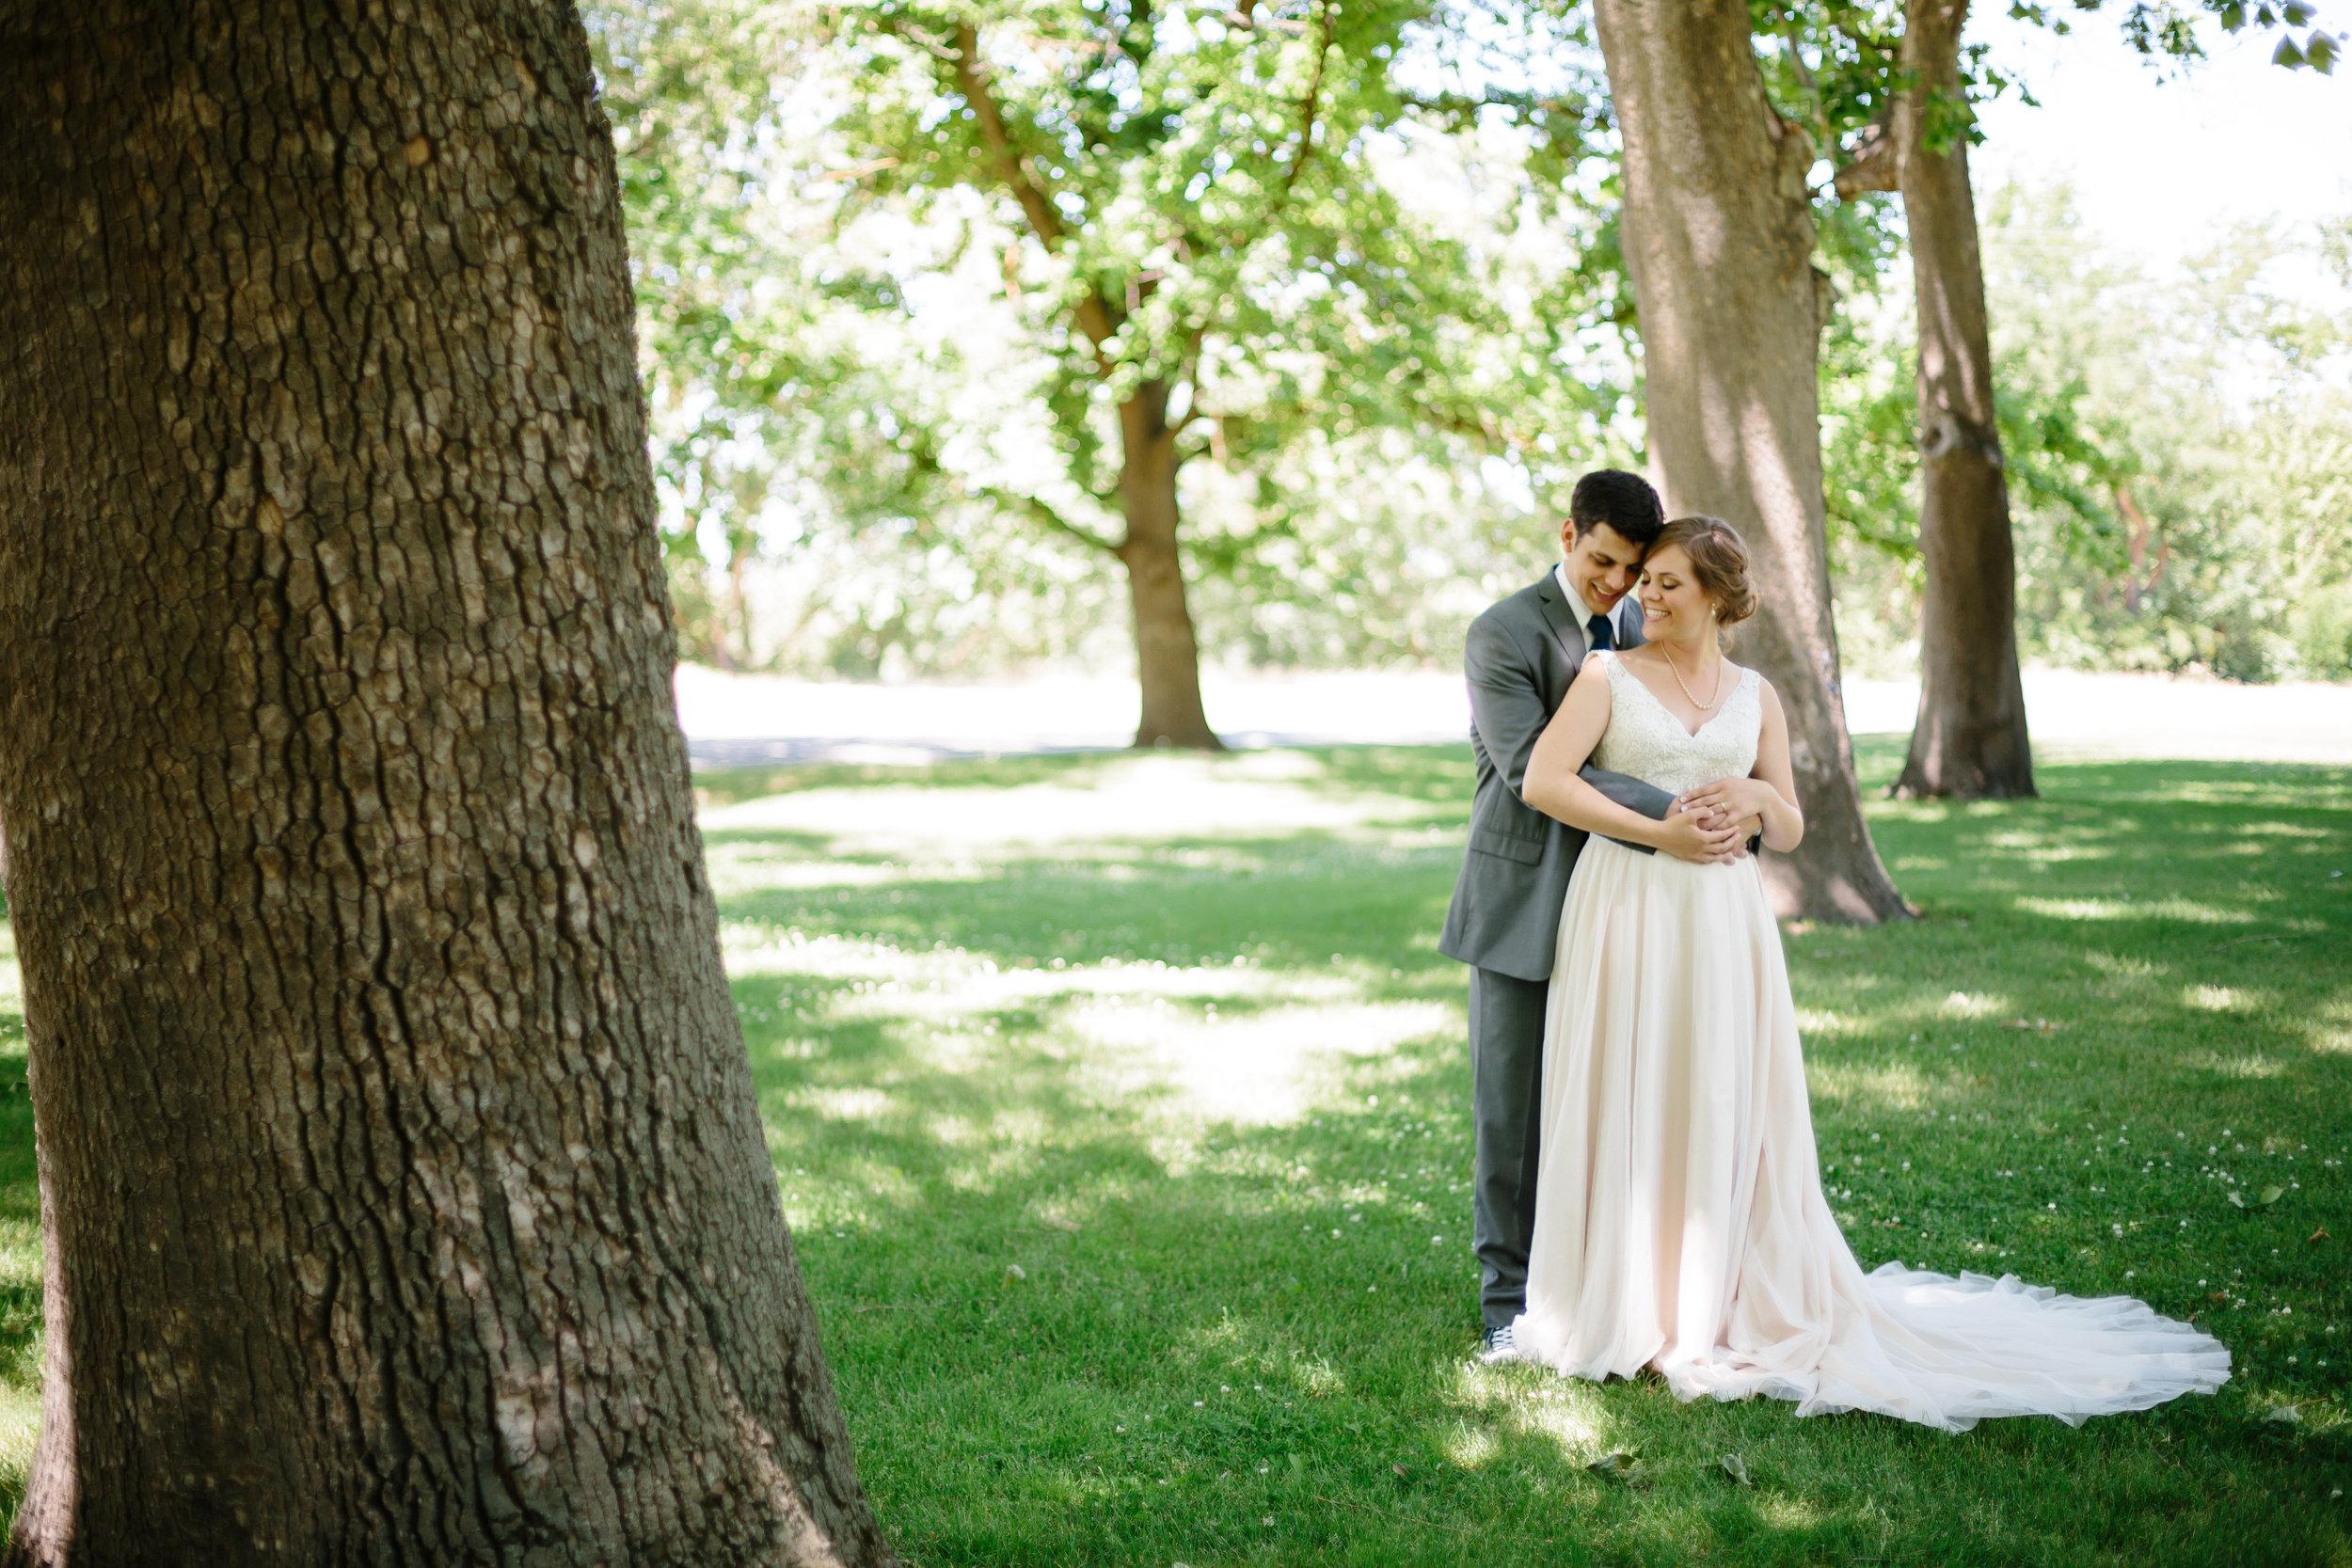 Jordan & Shantel Married - Idaho - Corrie Mick Photography-109.jpg